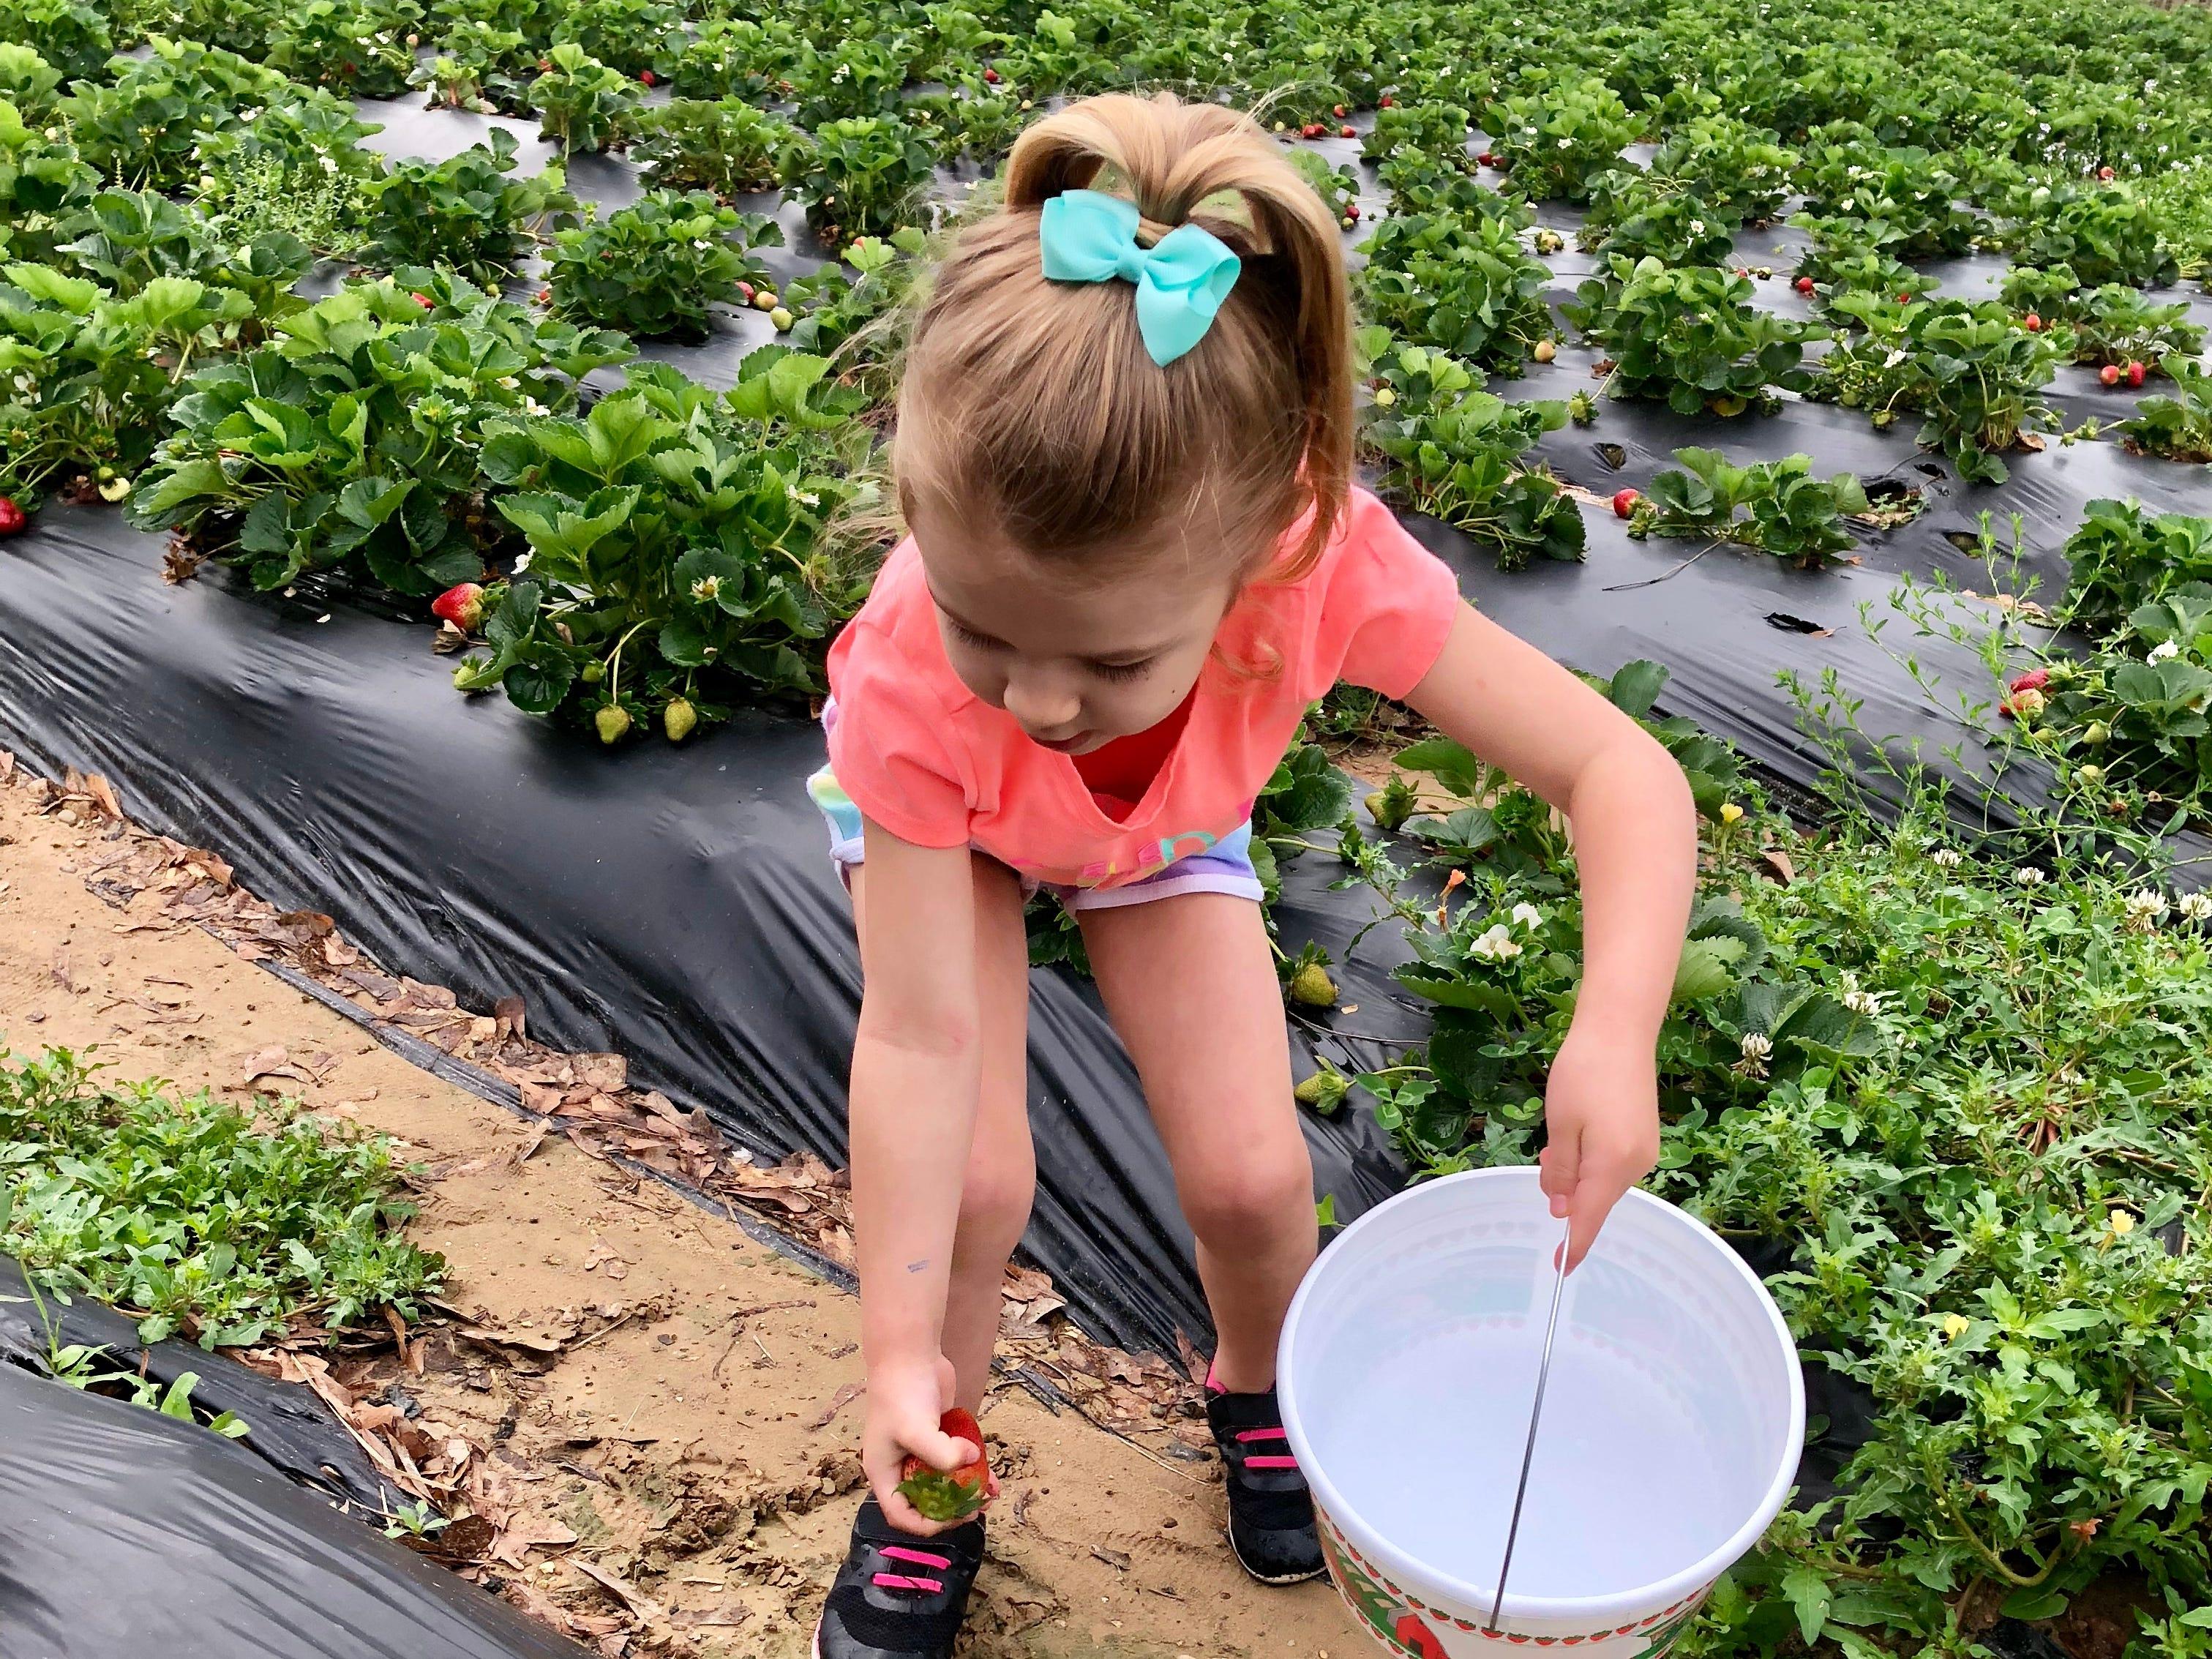 Avery Guidry, 4, picks strawberries April 6 at Mrs. Heather's Strawberry Farm in Albany, Louisiana.